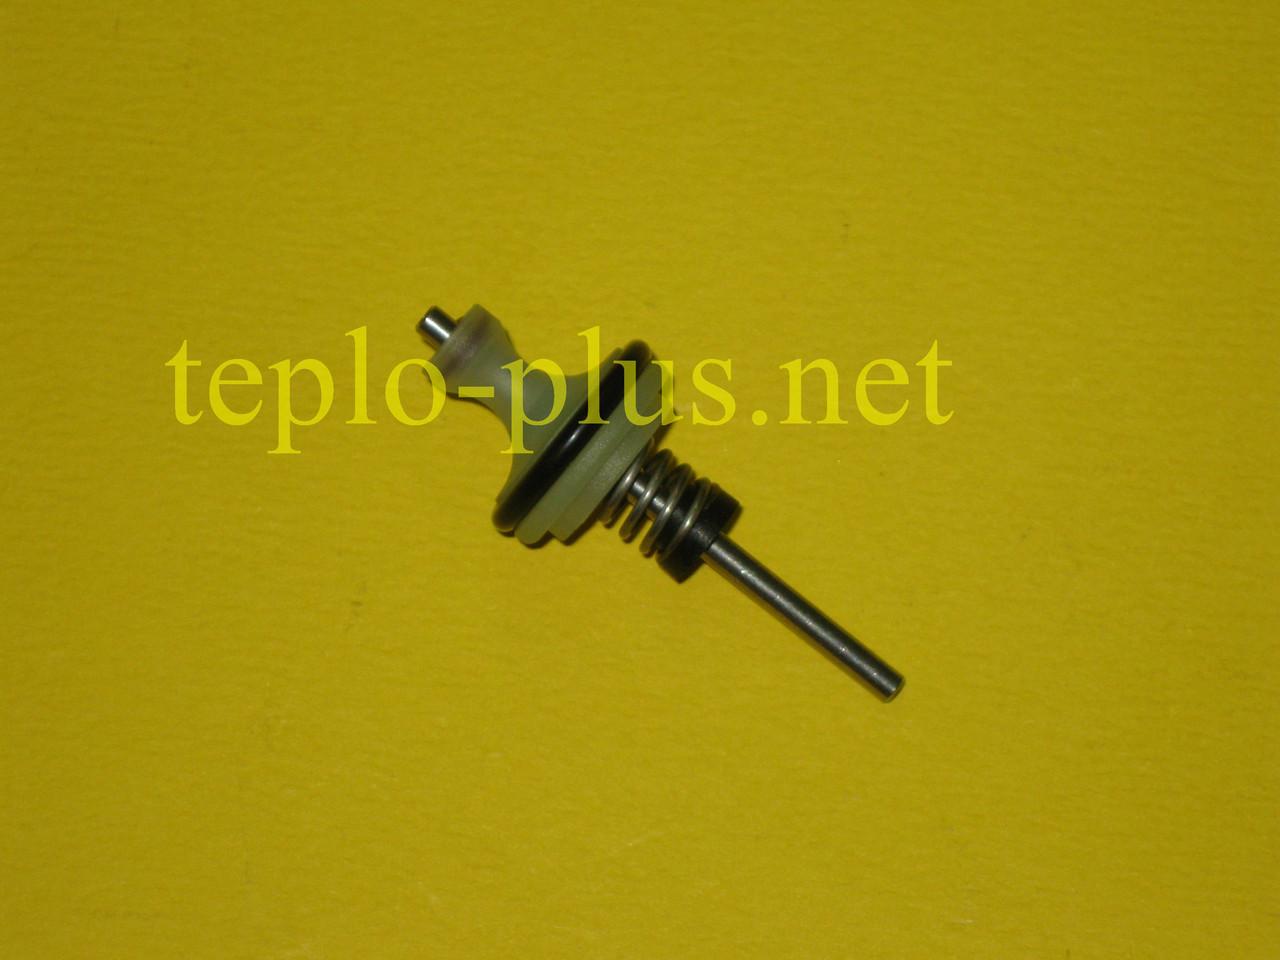 Шток трехходового клапана D003202760 (3003202760) Demrad Atron H24, H28